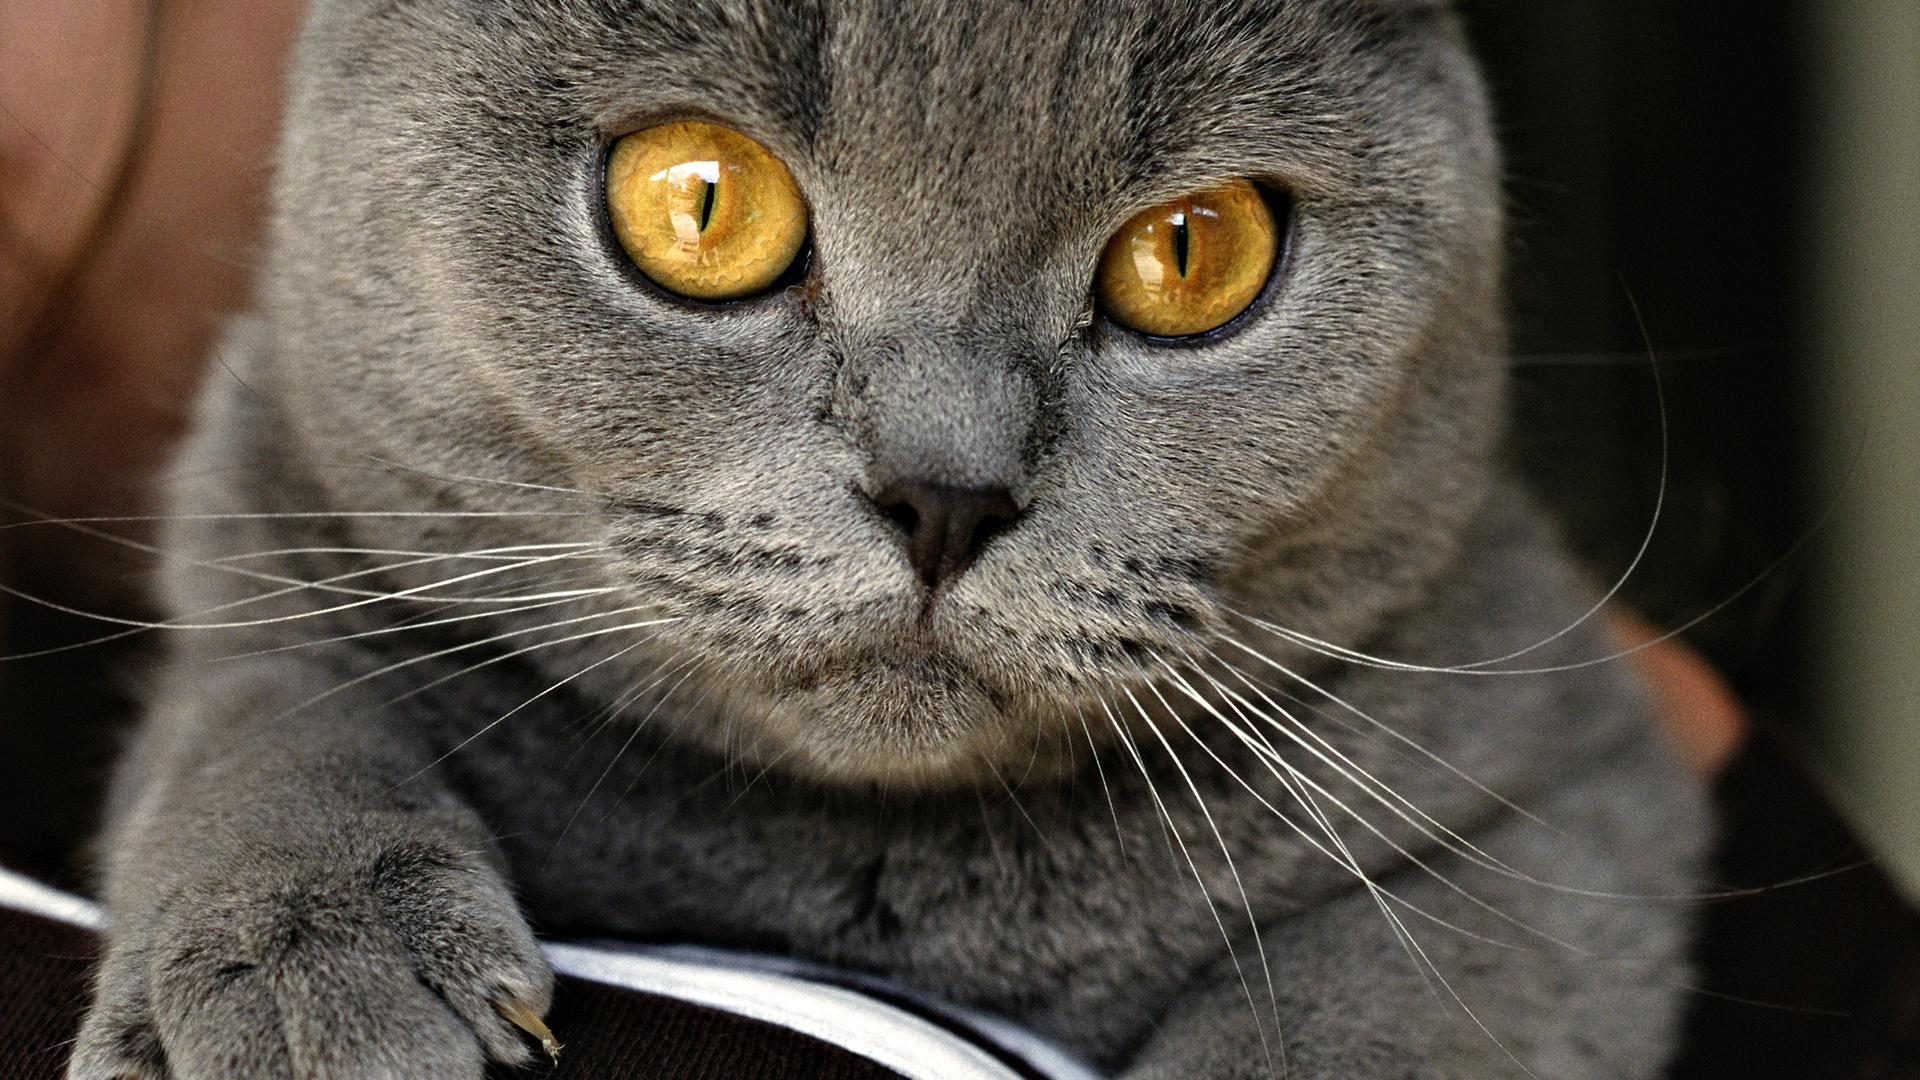 Kartuzijska mačka (CHA) Chartreux - slika 2